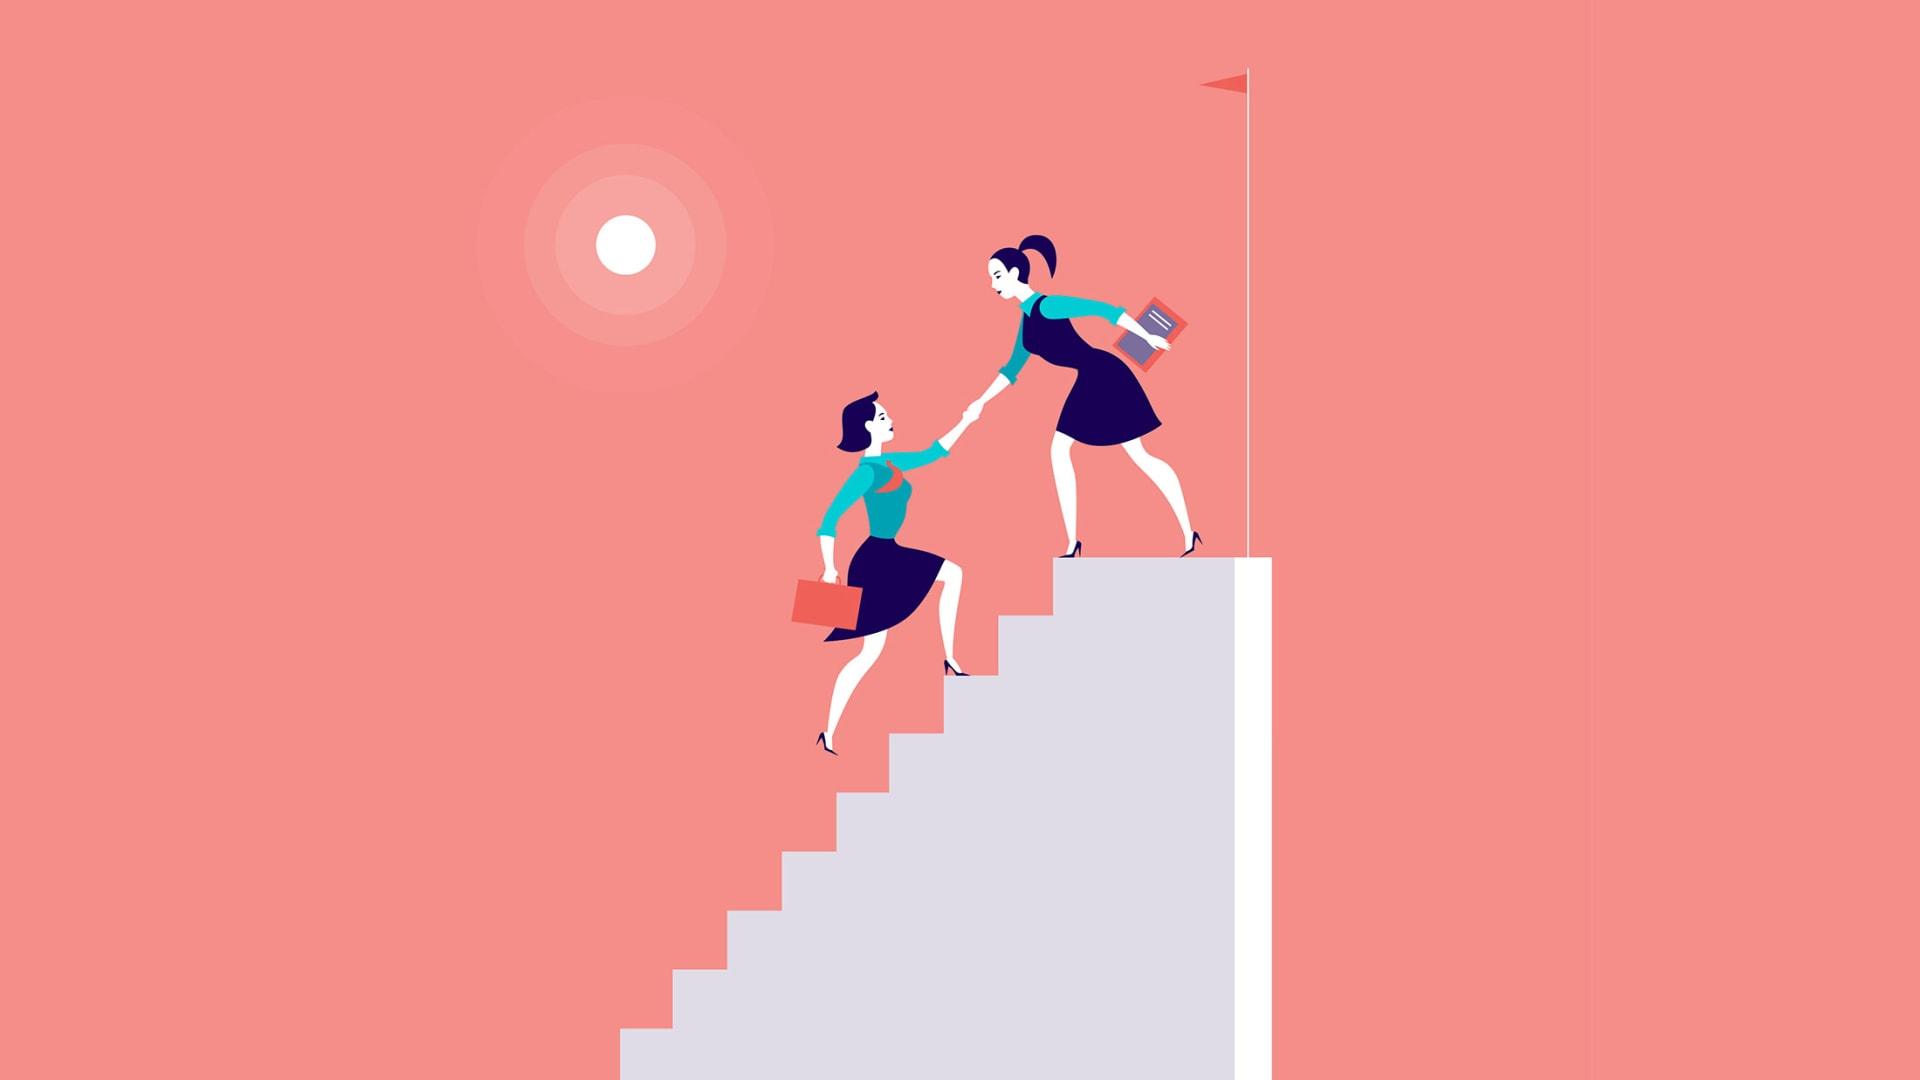 5 Leadership Strategies to Help Women Prosper in the Workplace